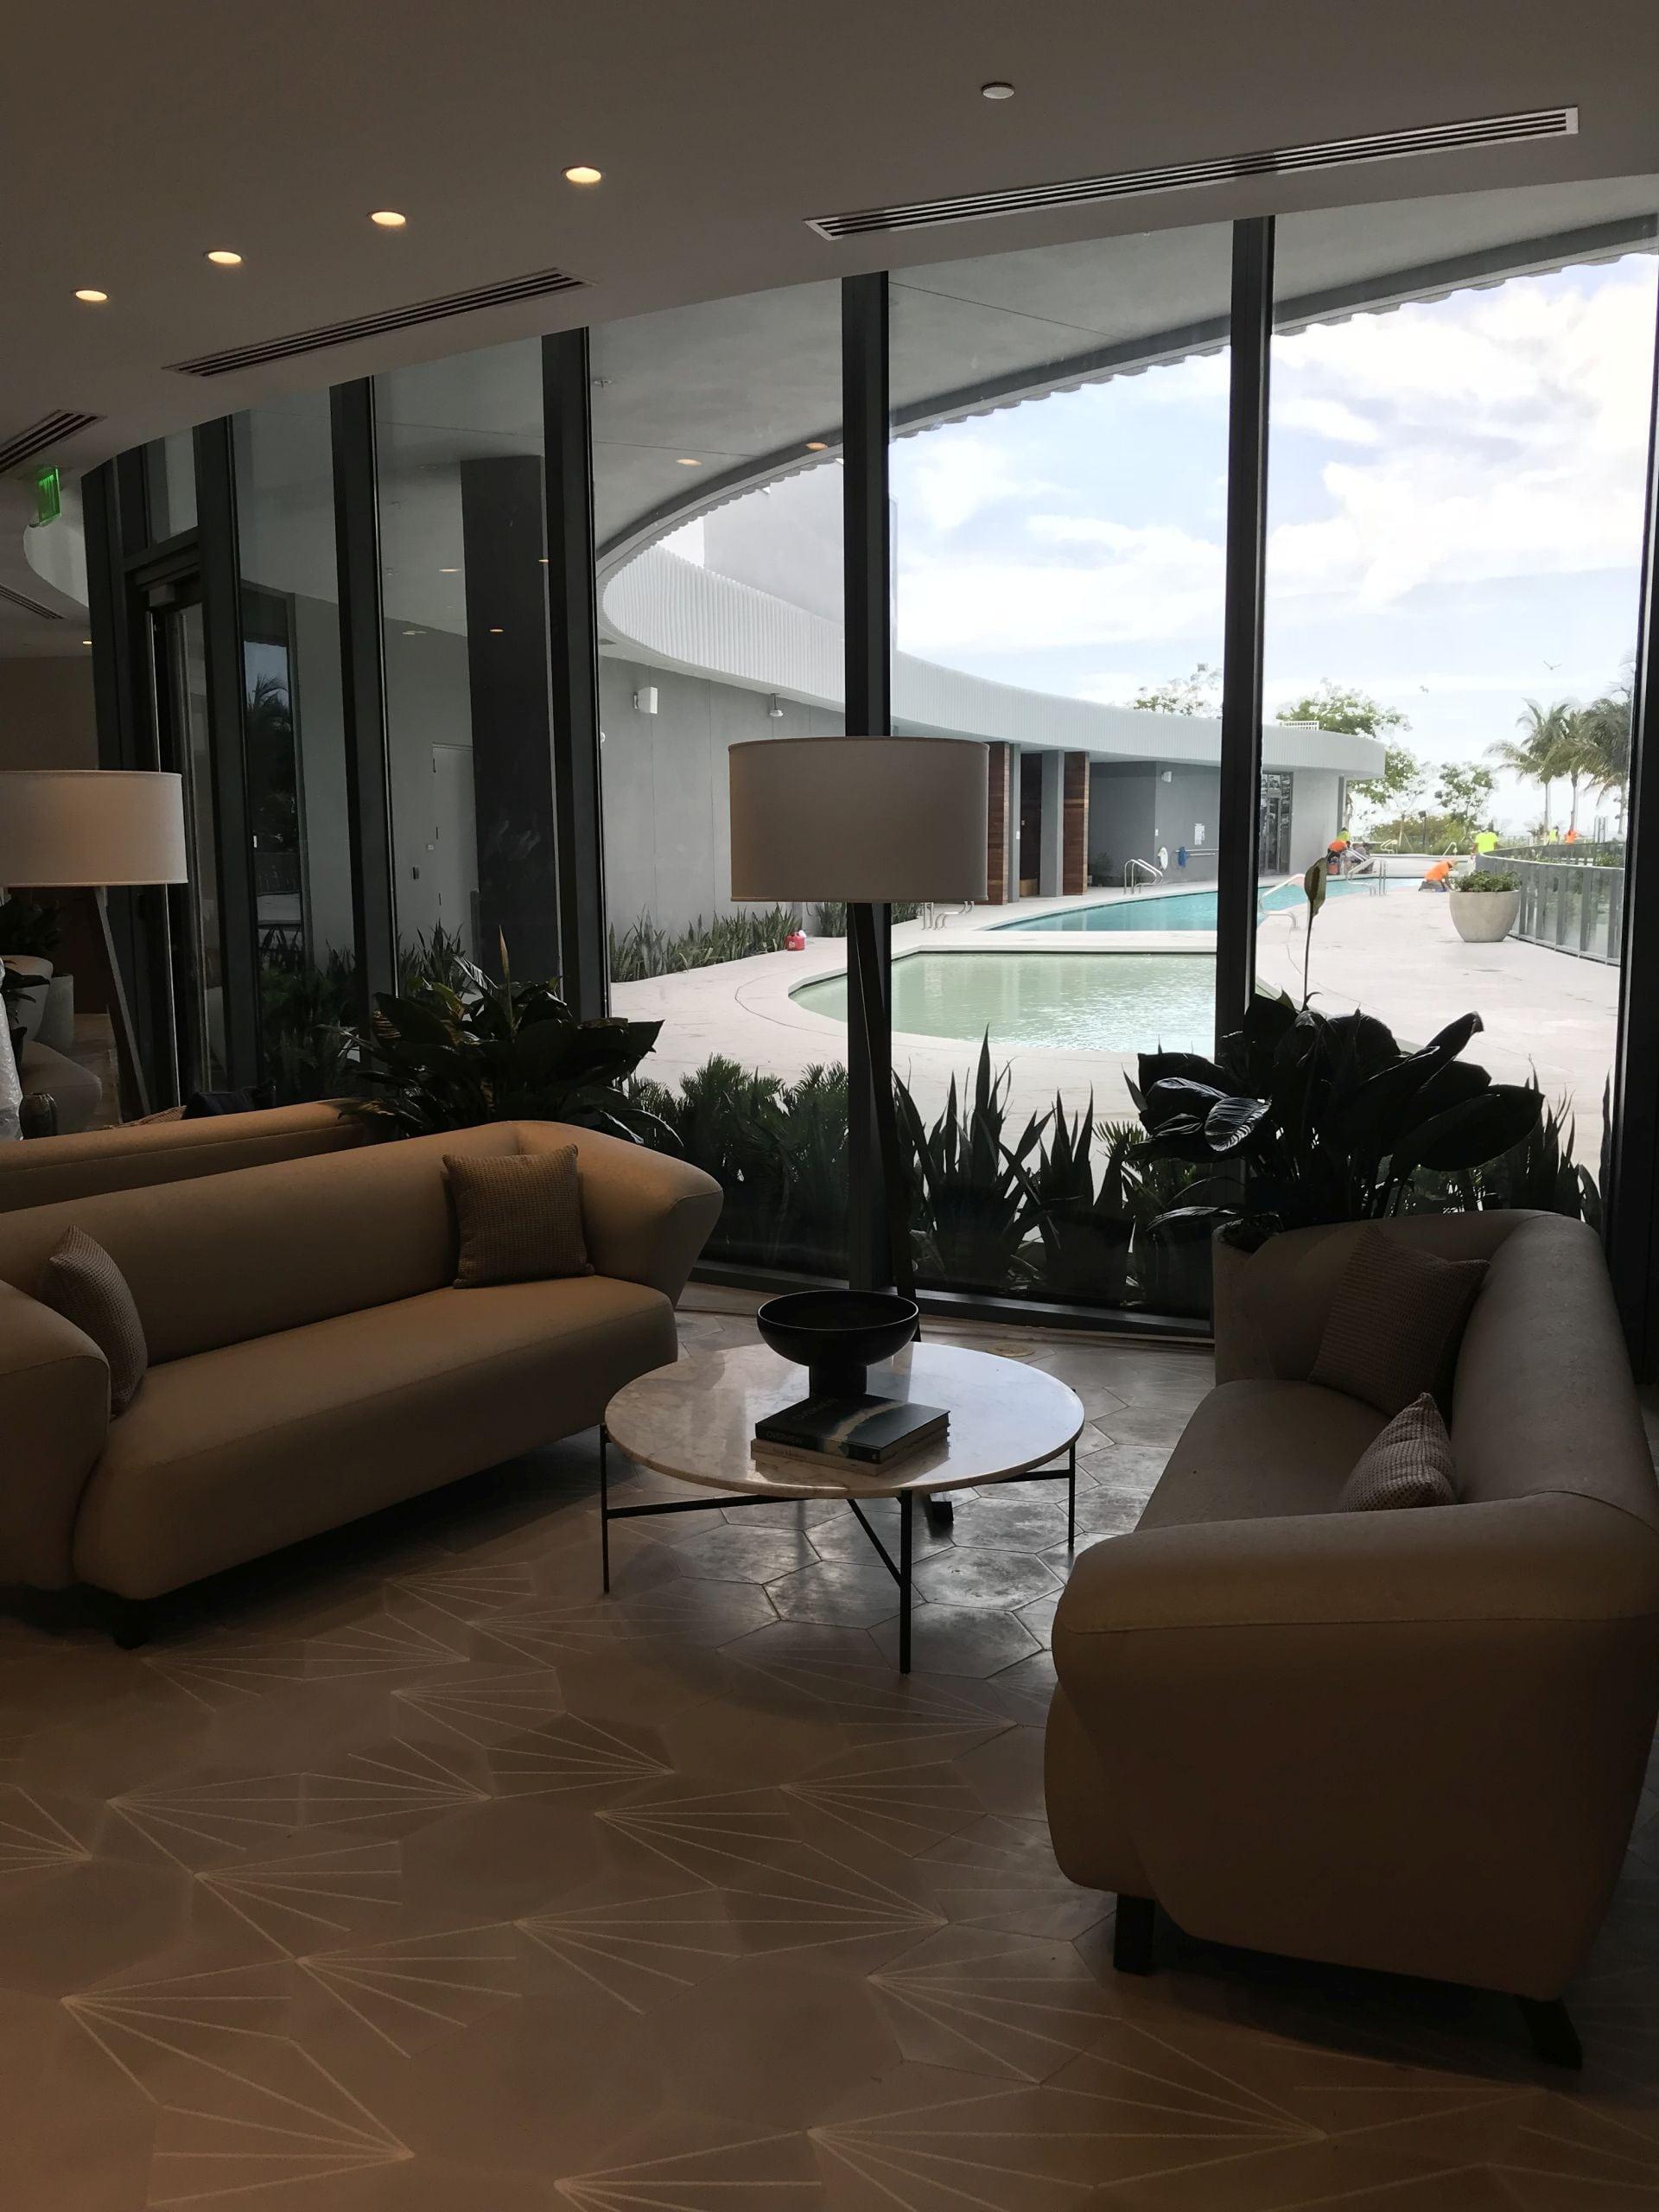 poolside restaurant lounge area